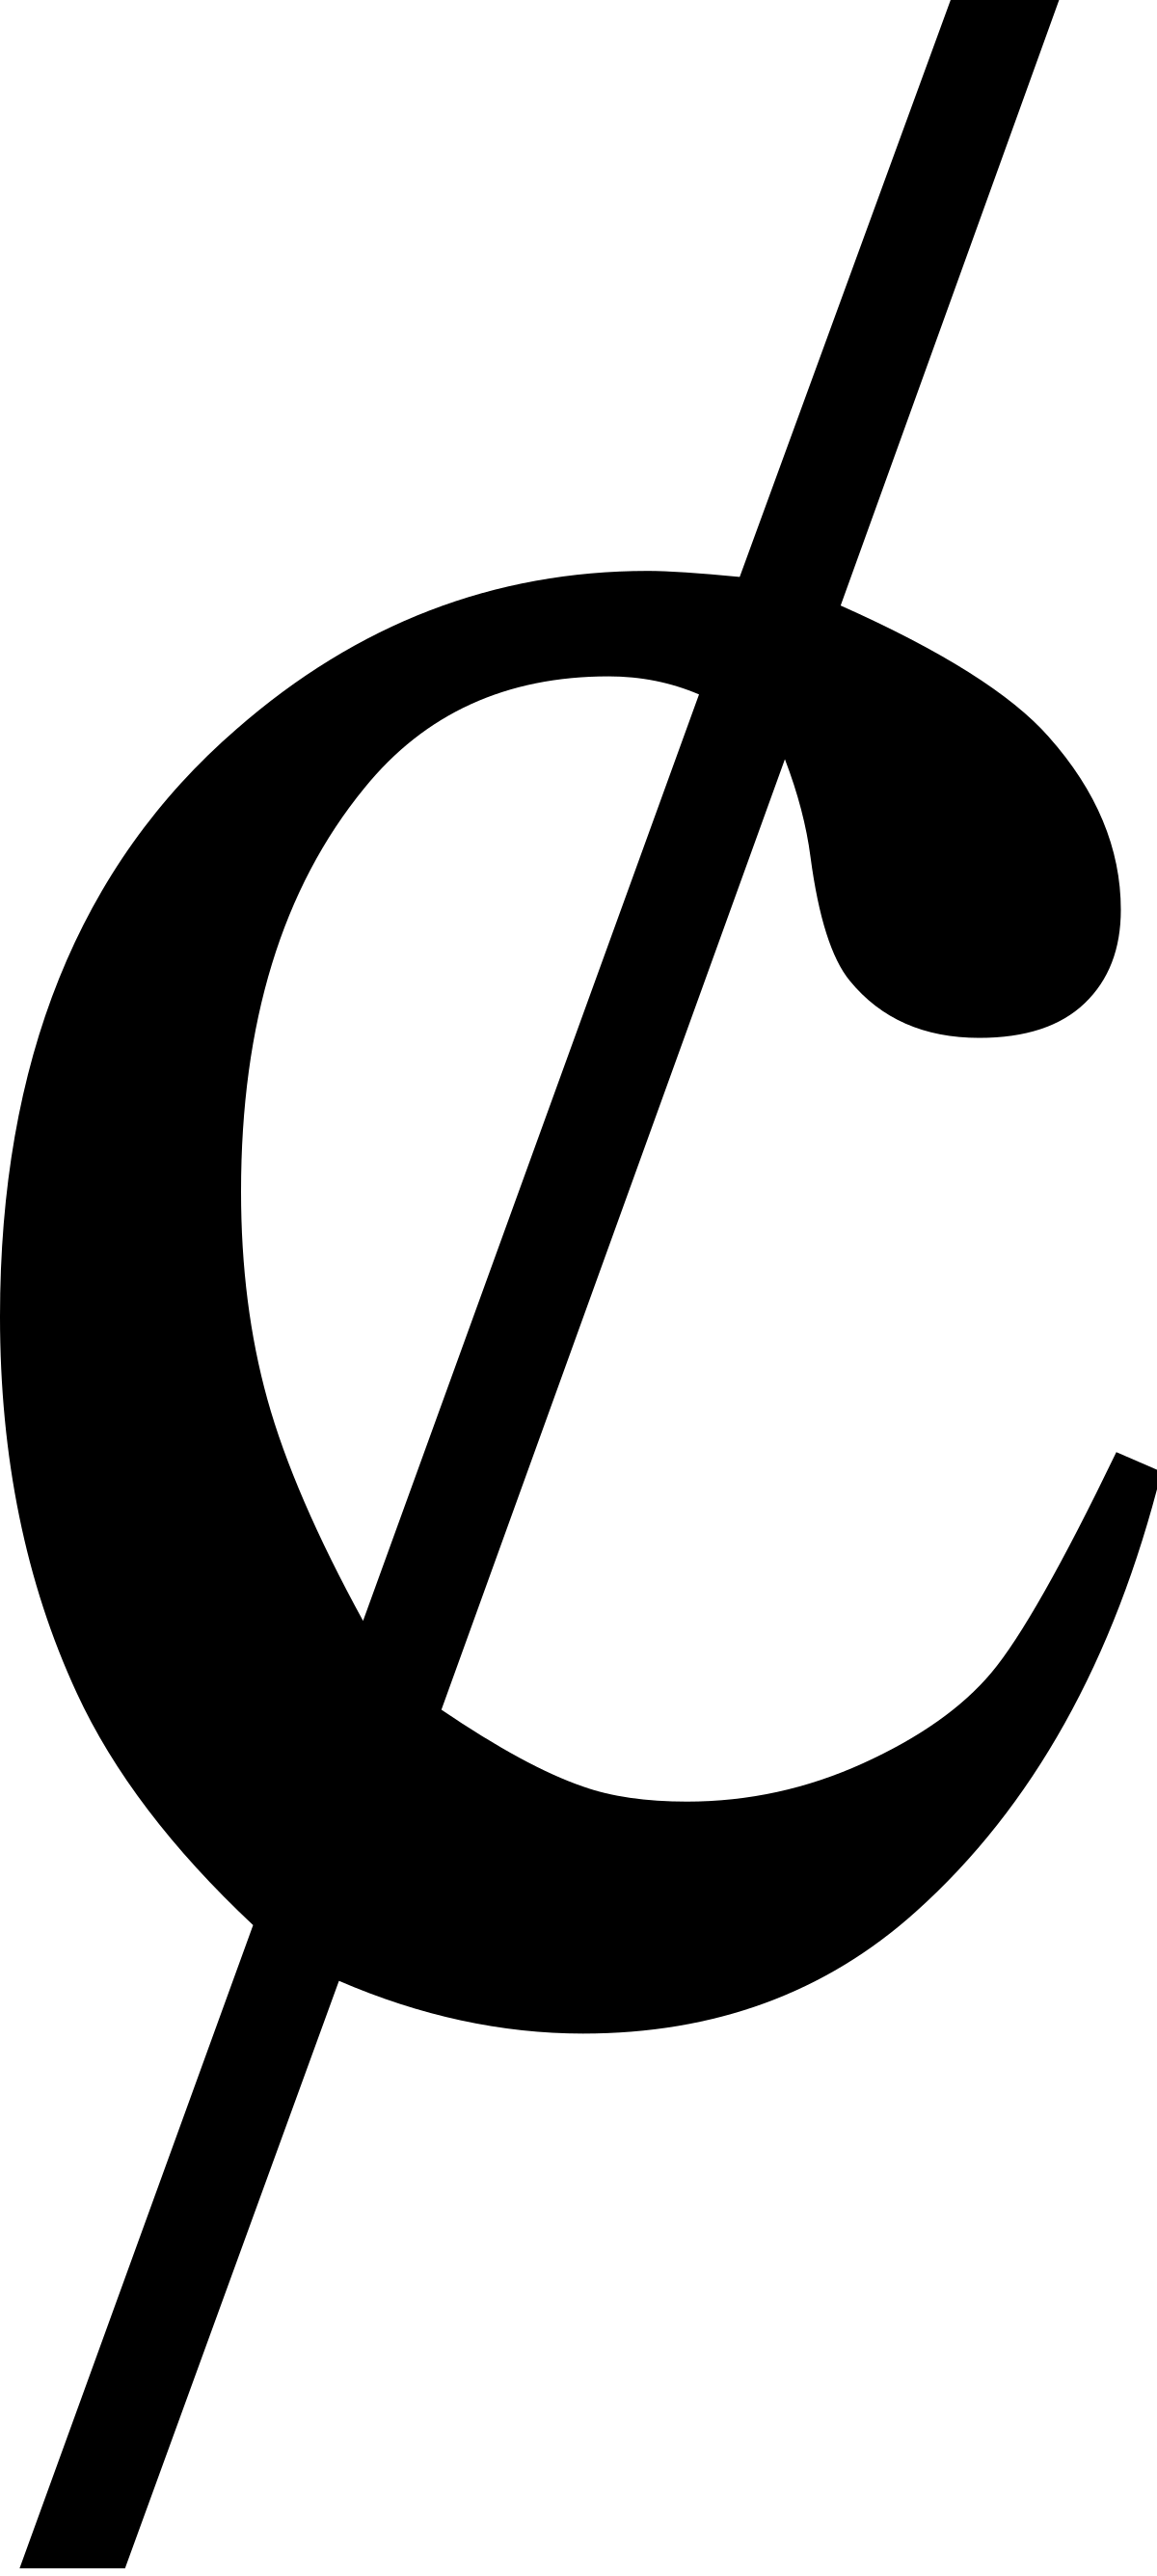 Download Cents Symbol Png.